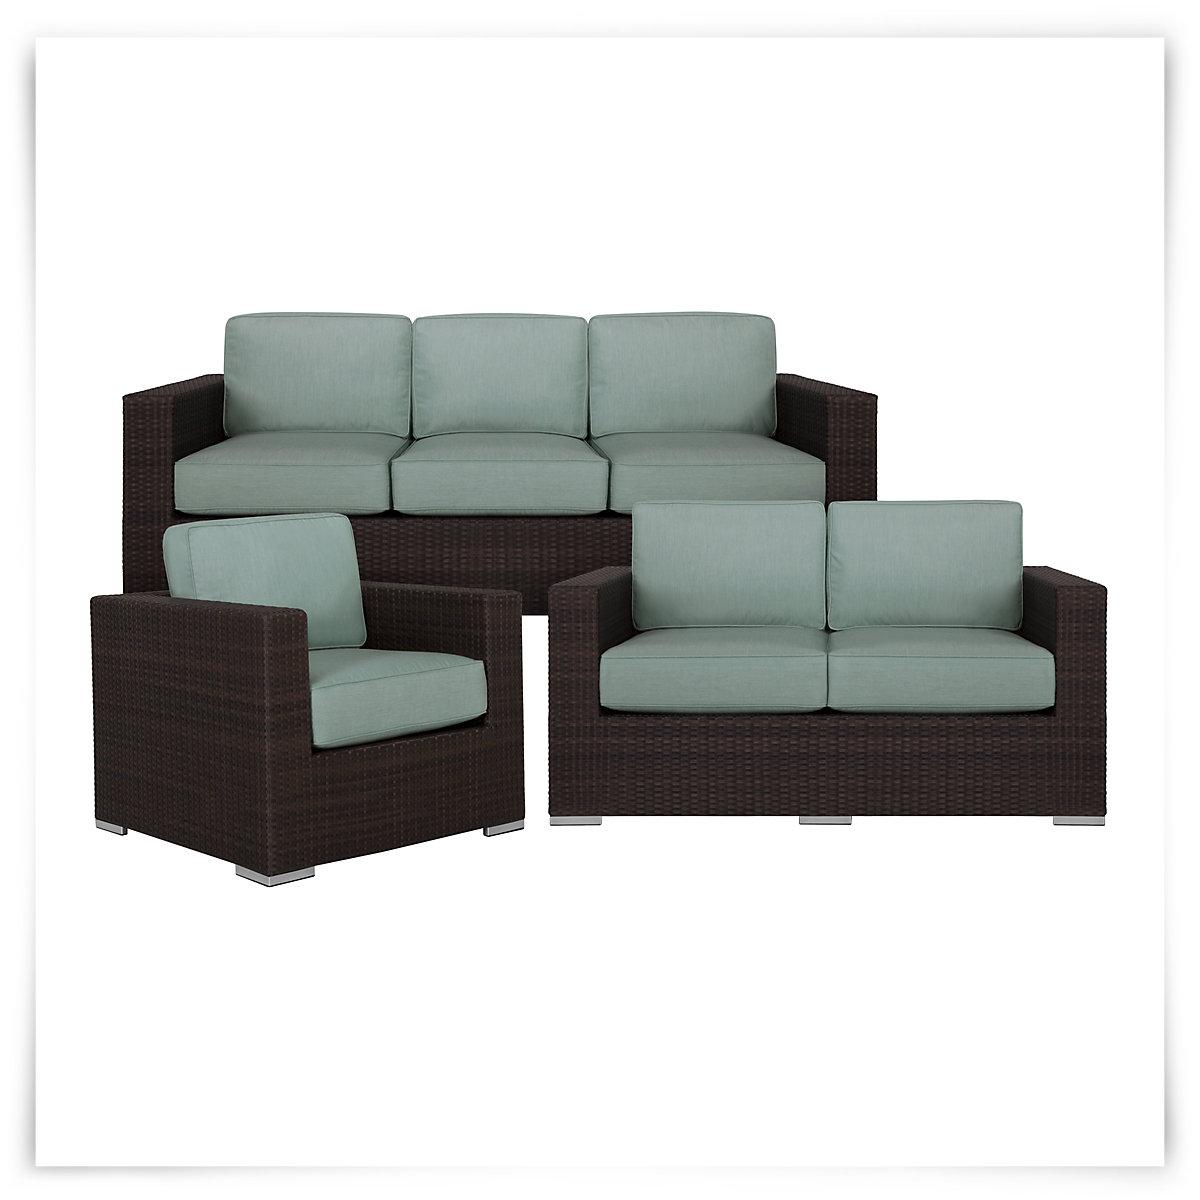 City Furniture Fina Teal Outdoor Living Room Set